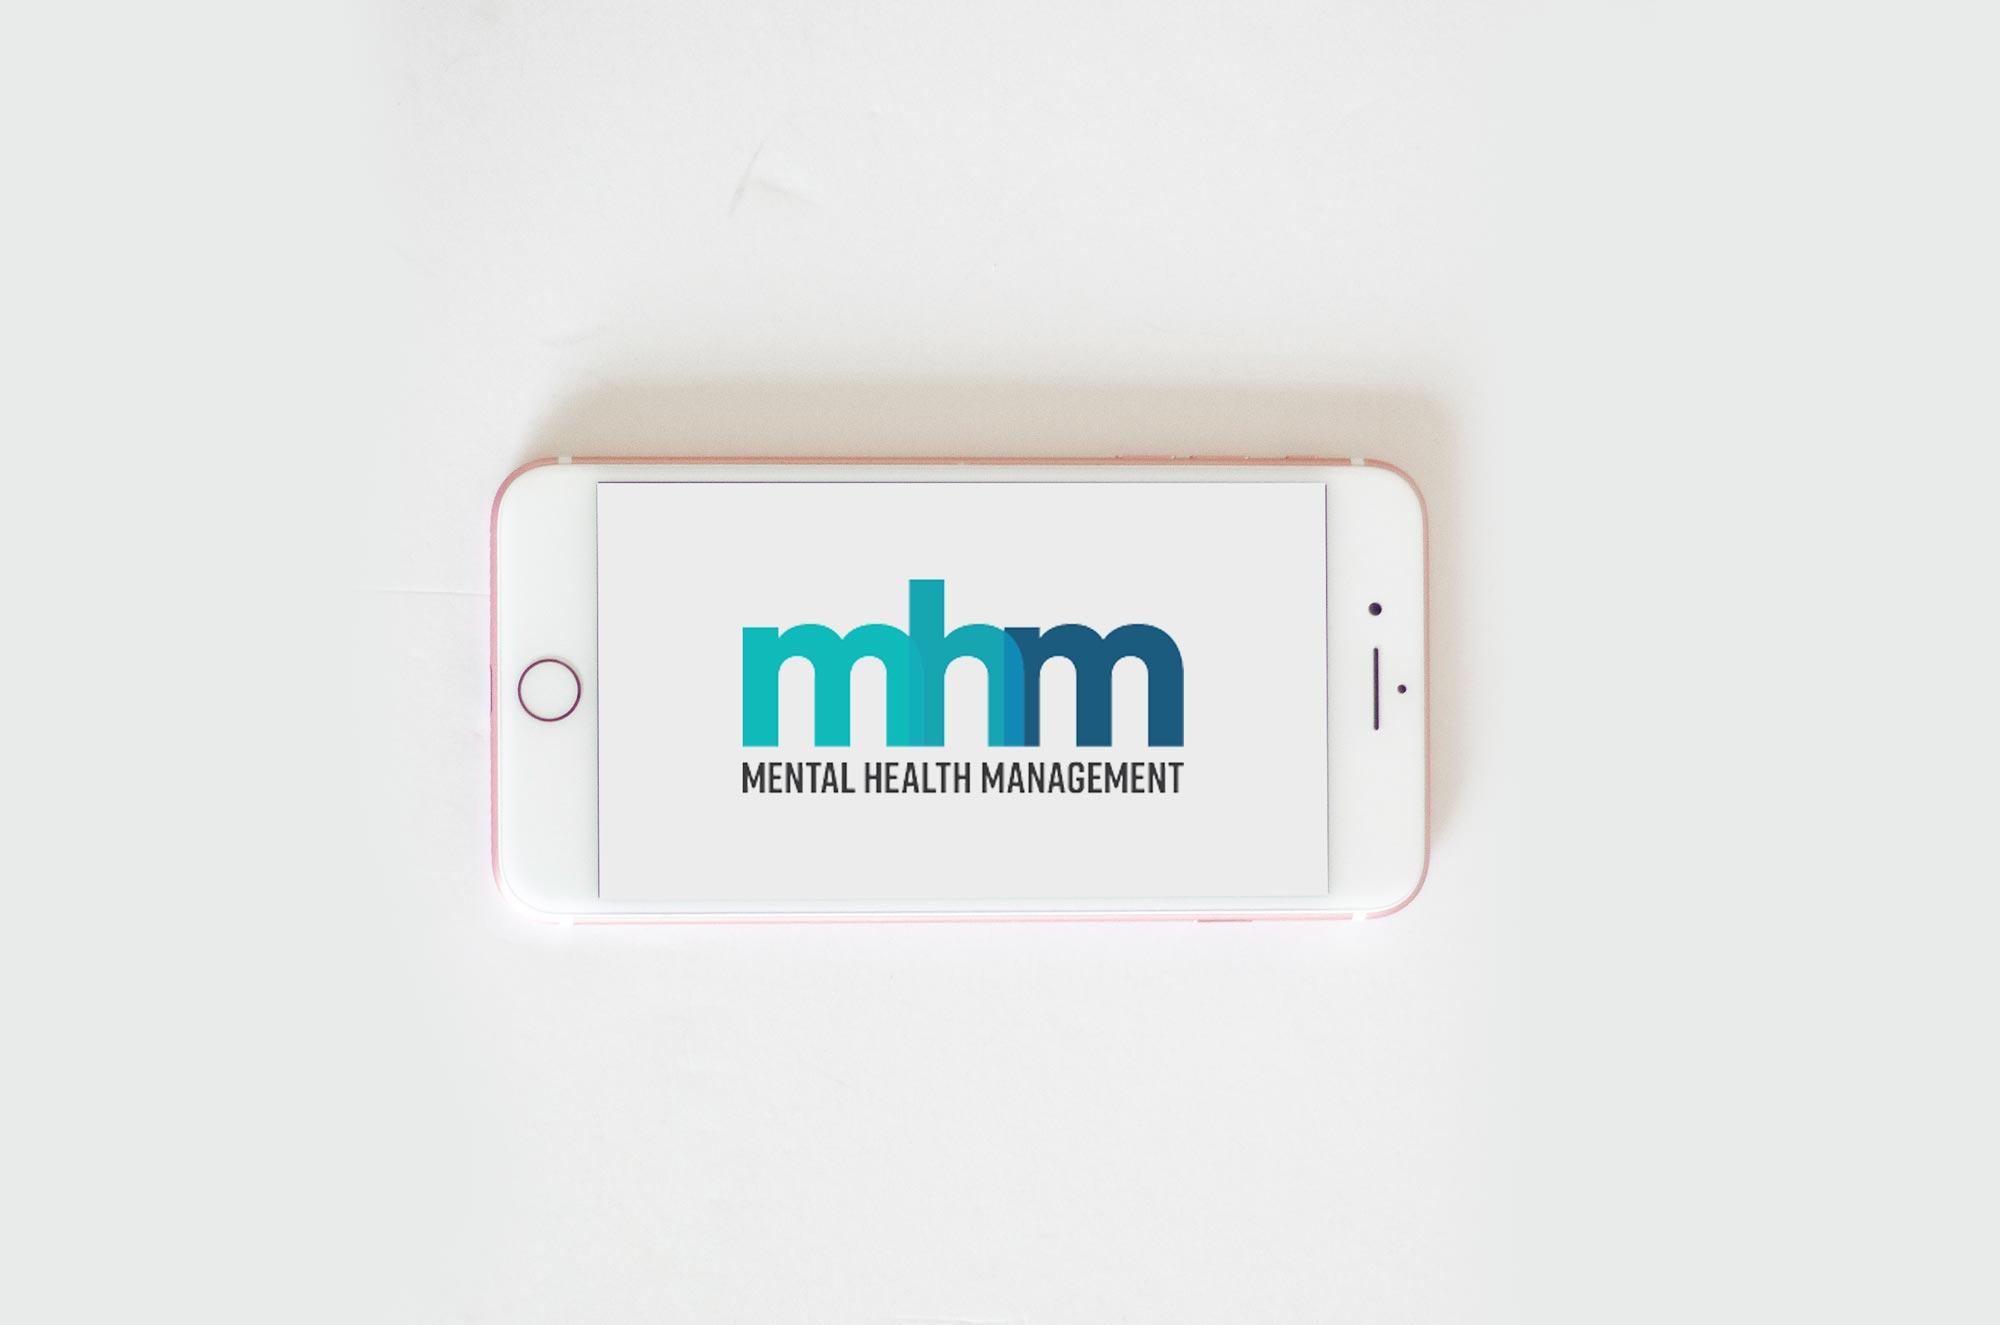 Mental Health Management